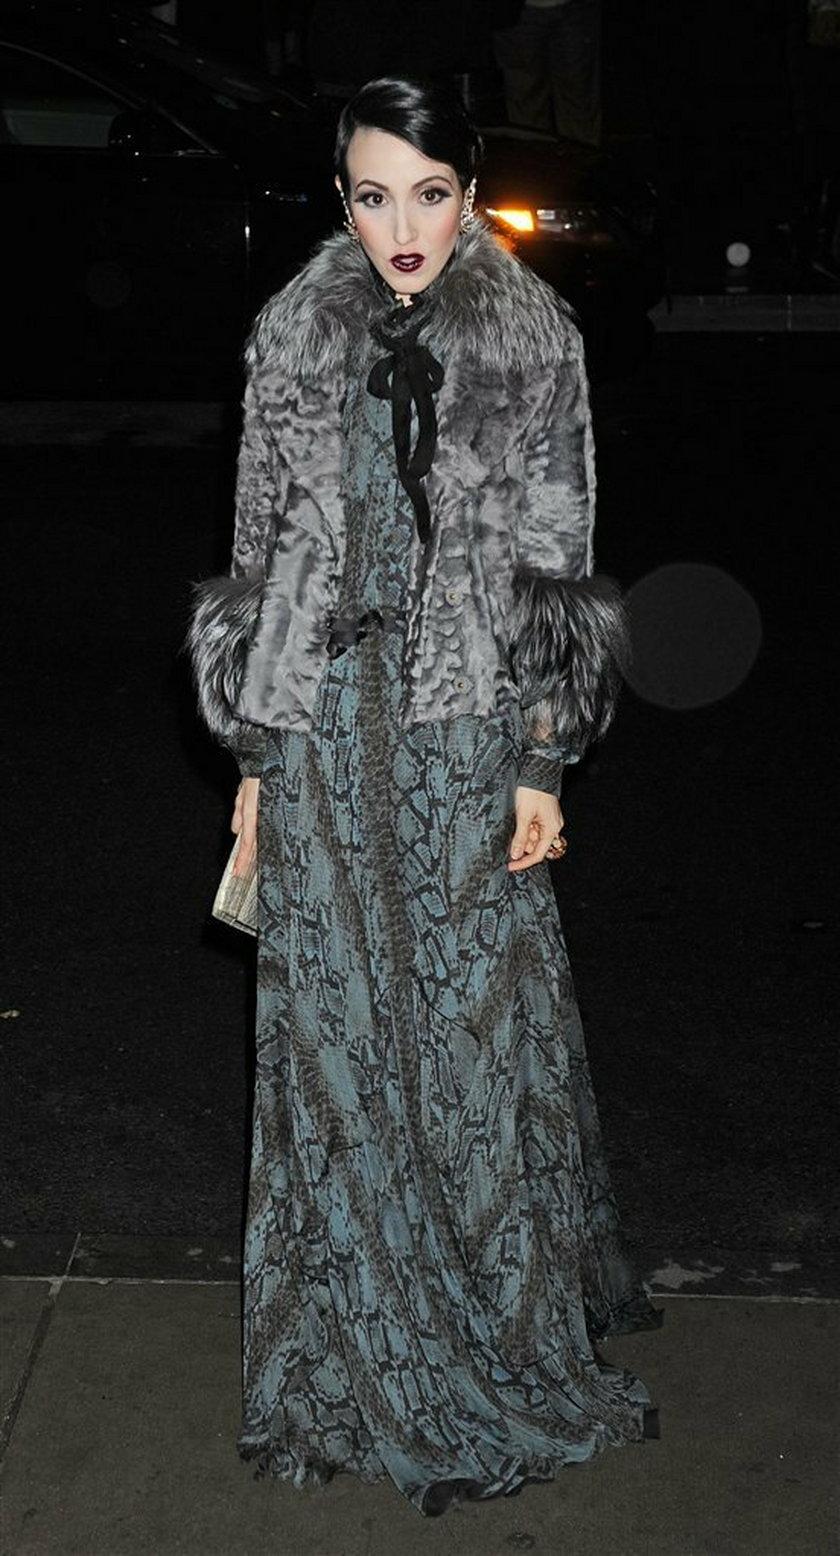 Michelle Harper styl